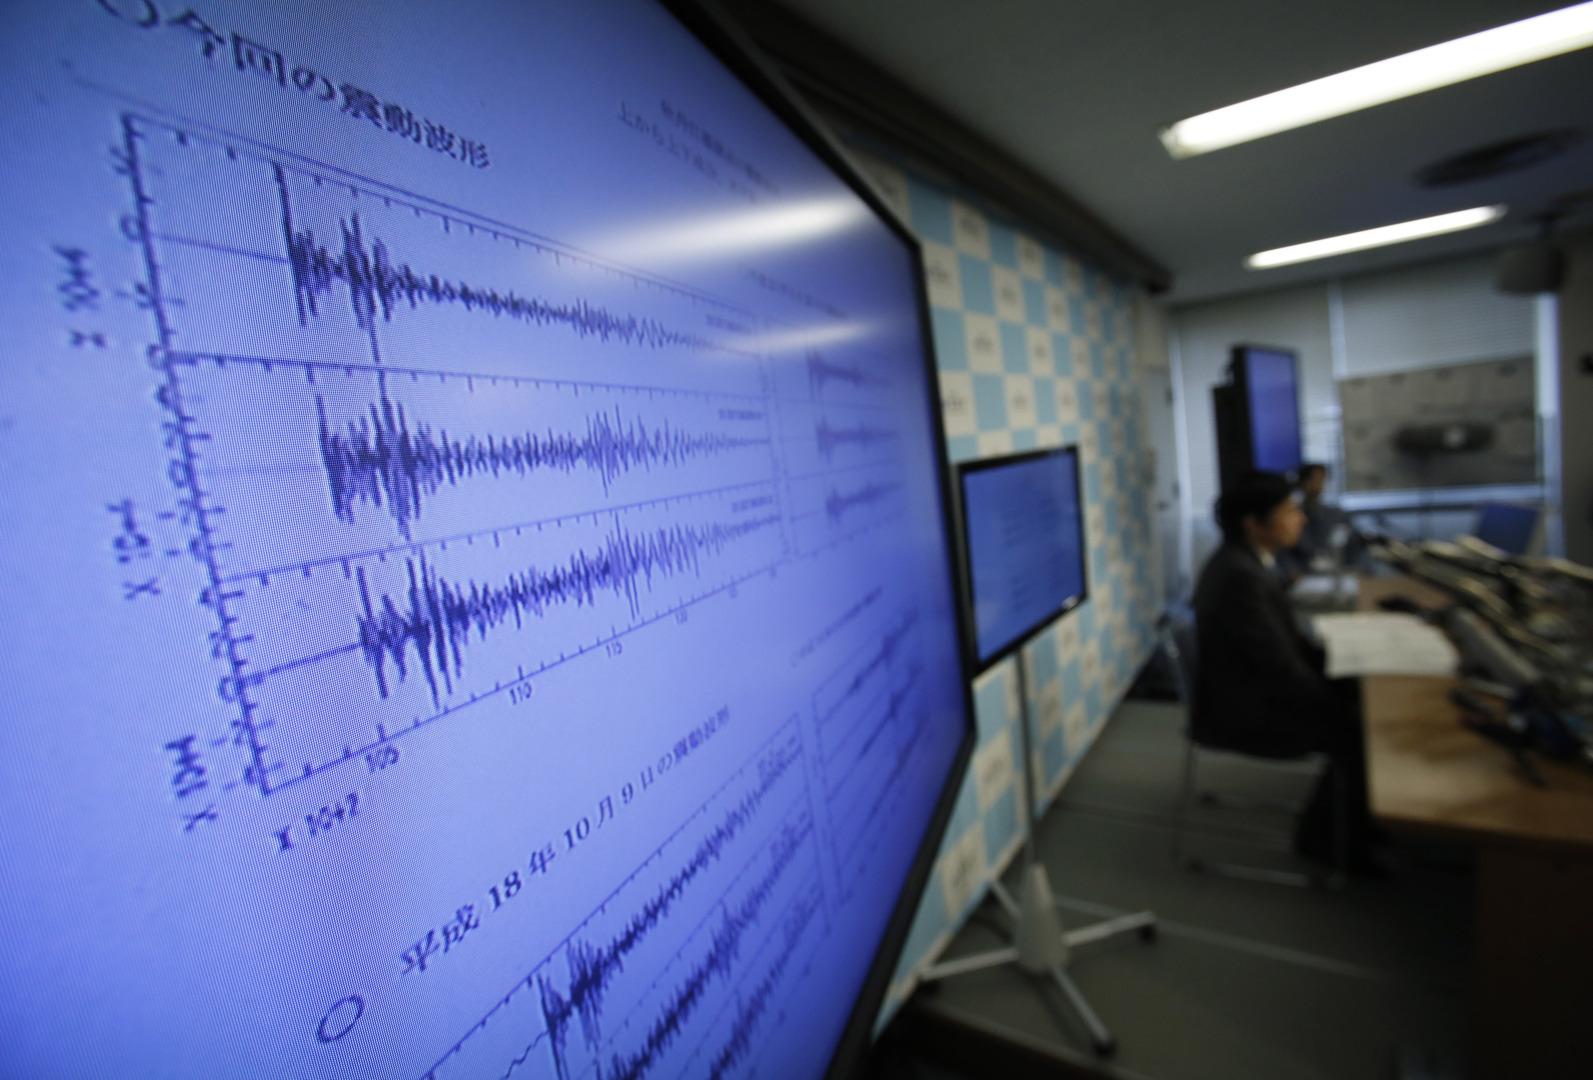 مركز لرصد الزلازل